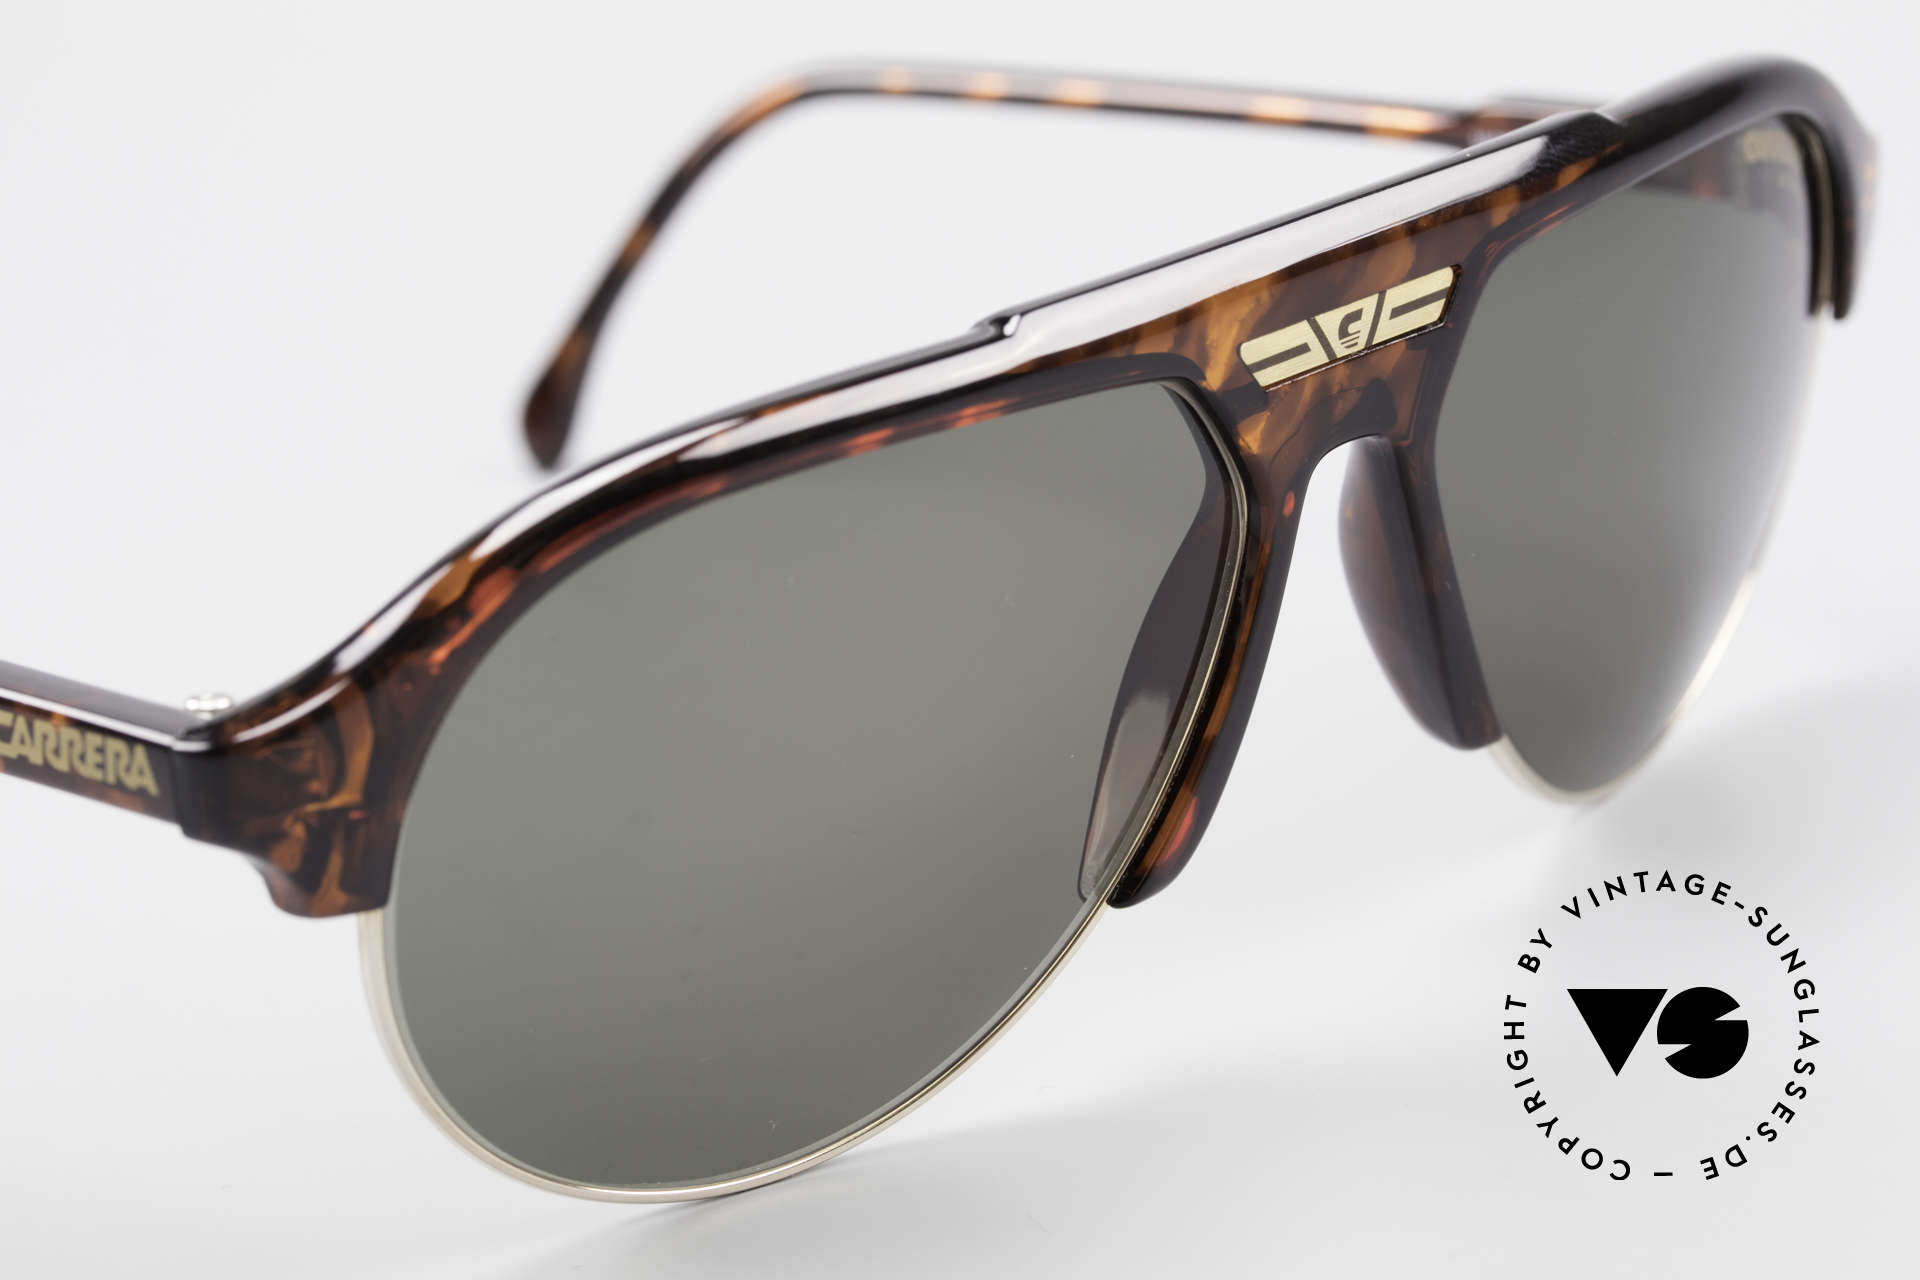 Carrera 5433 Aviator Sunglasses Men 90's, NO RETRO shades, but an app. 25 years old ORIGINAL, Made for Men